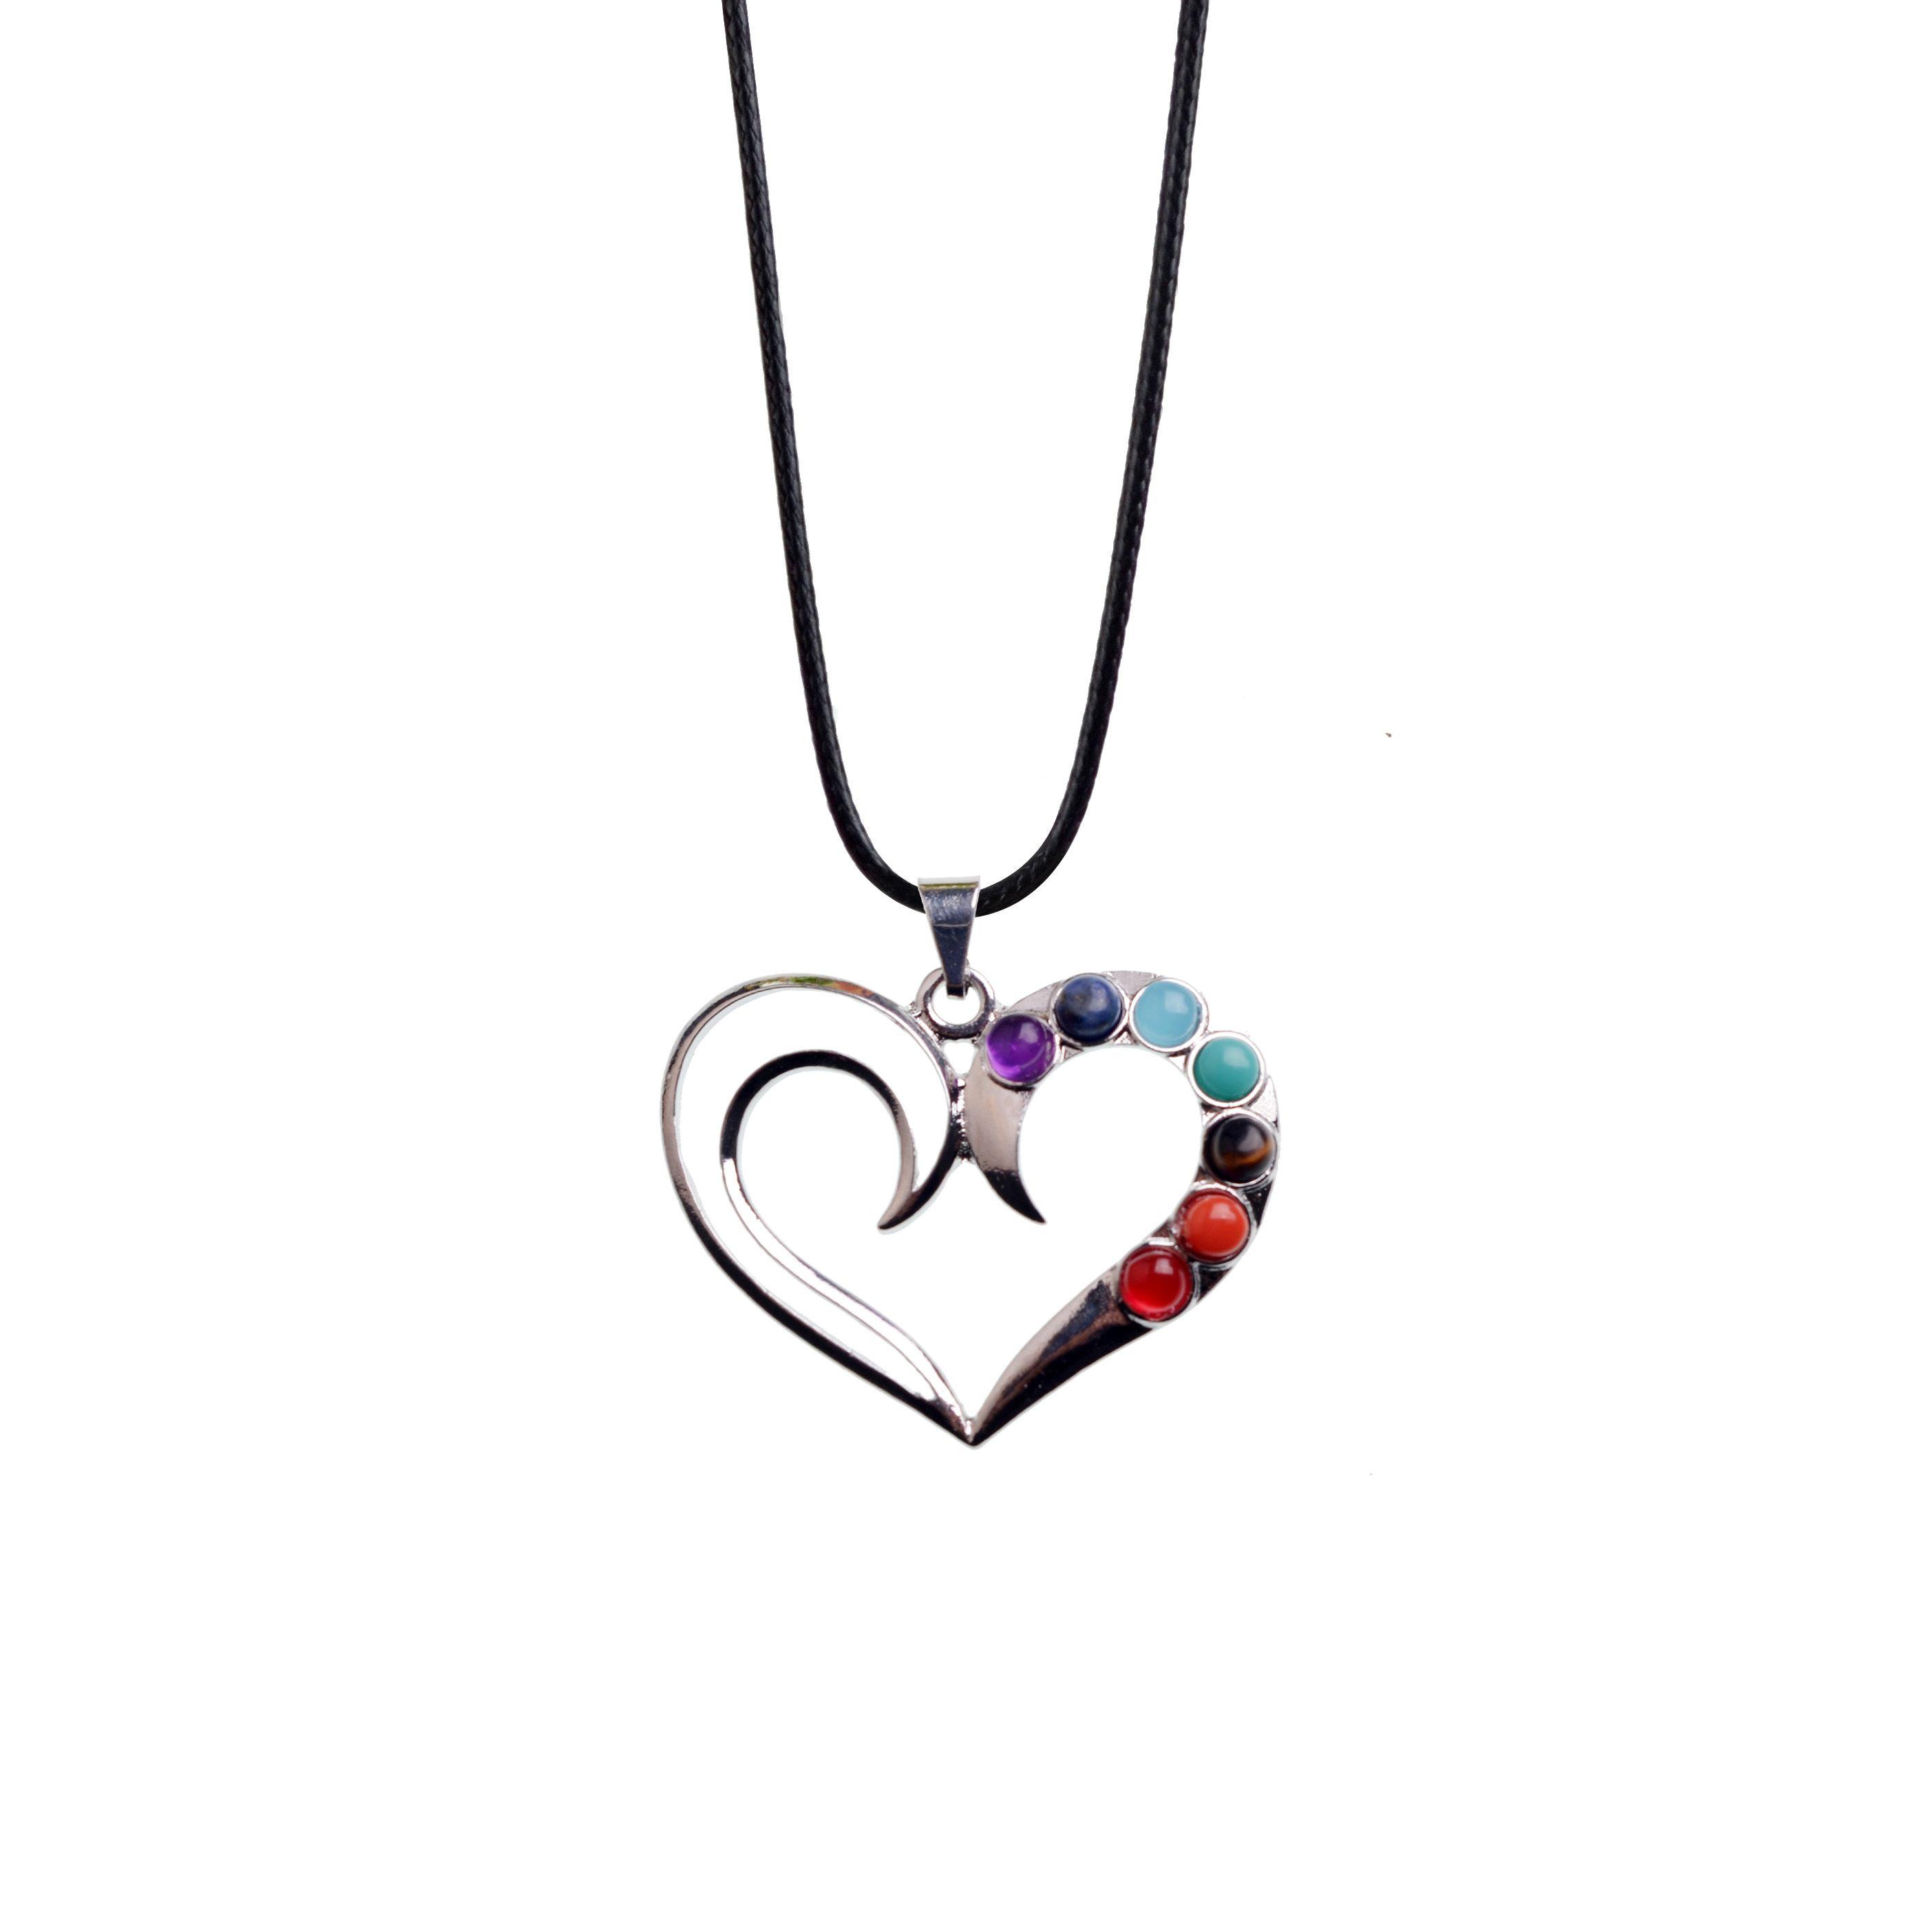 8bf63c7bd8c84 Seven chakra gemstone handmade heart necklace ladies winter sweater  exquisite necklace